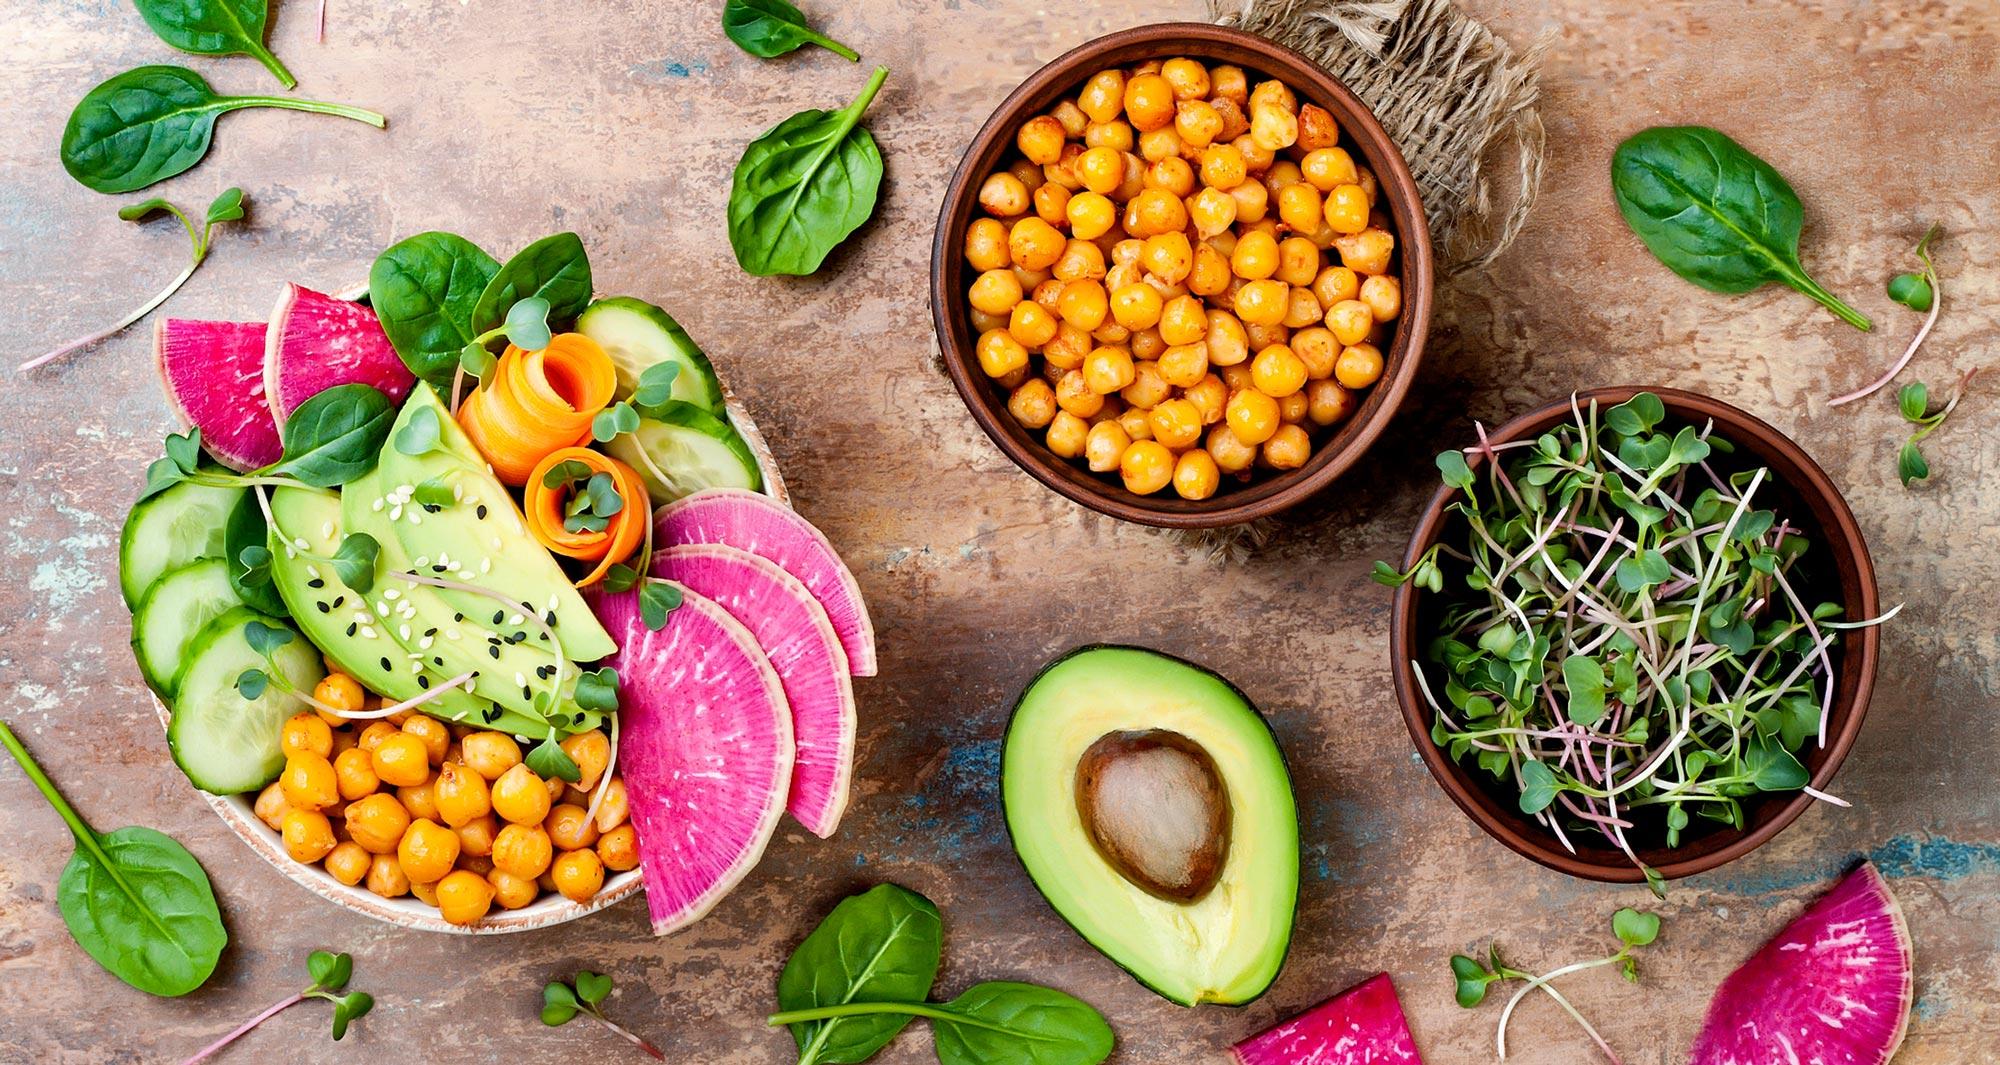 blog-featured-veganism1-20180117-1430.jpg